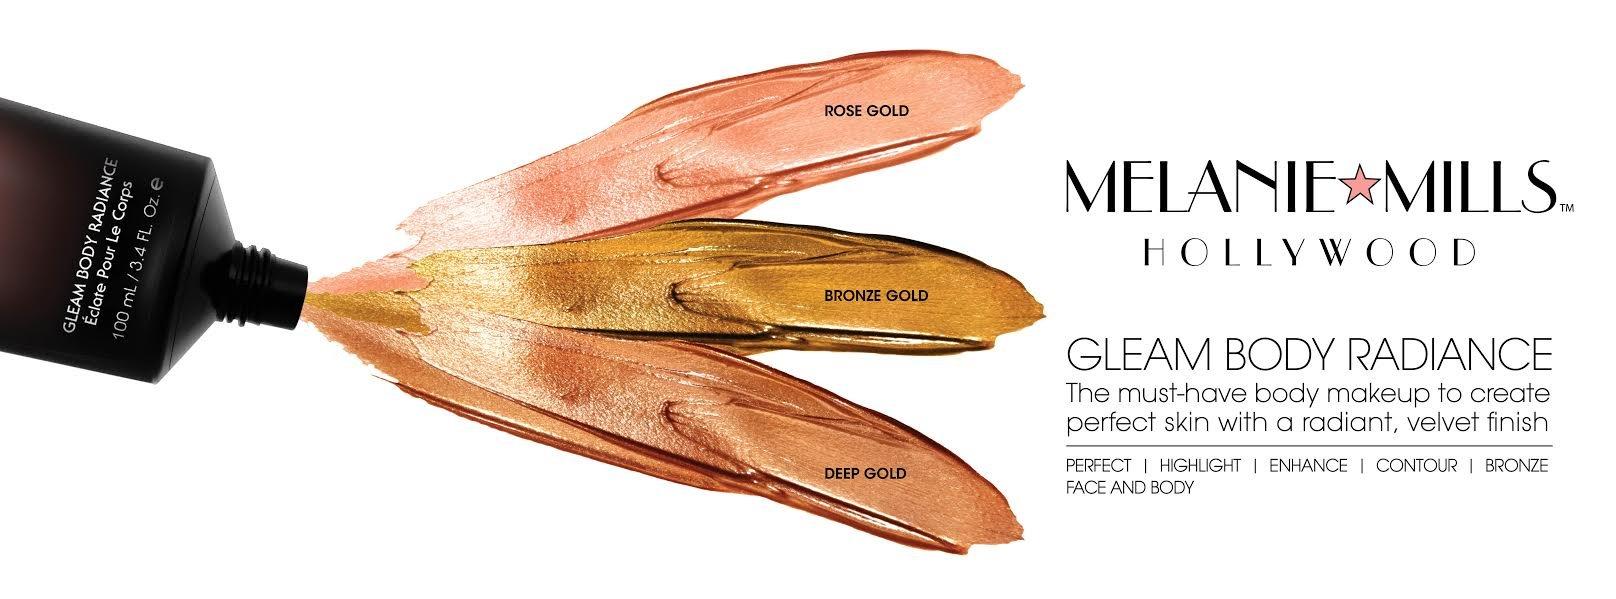 Melanie Mills Hollywood Moisturizing Gleam Body Radiance - Deep Gold, 1 fl.oz.